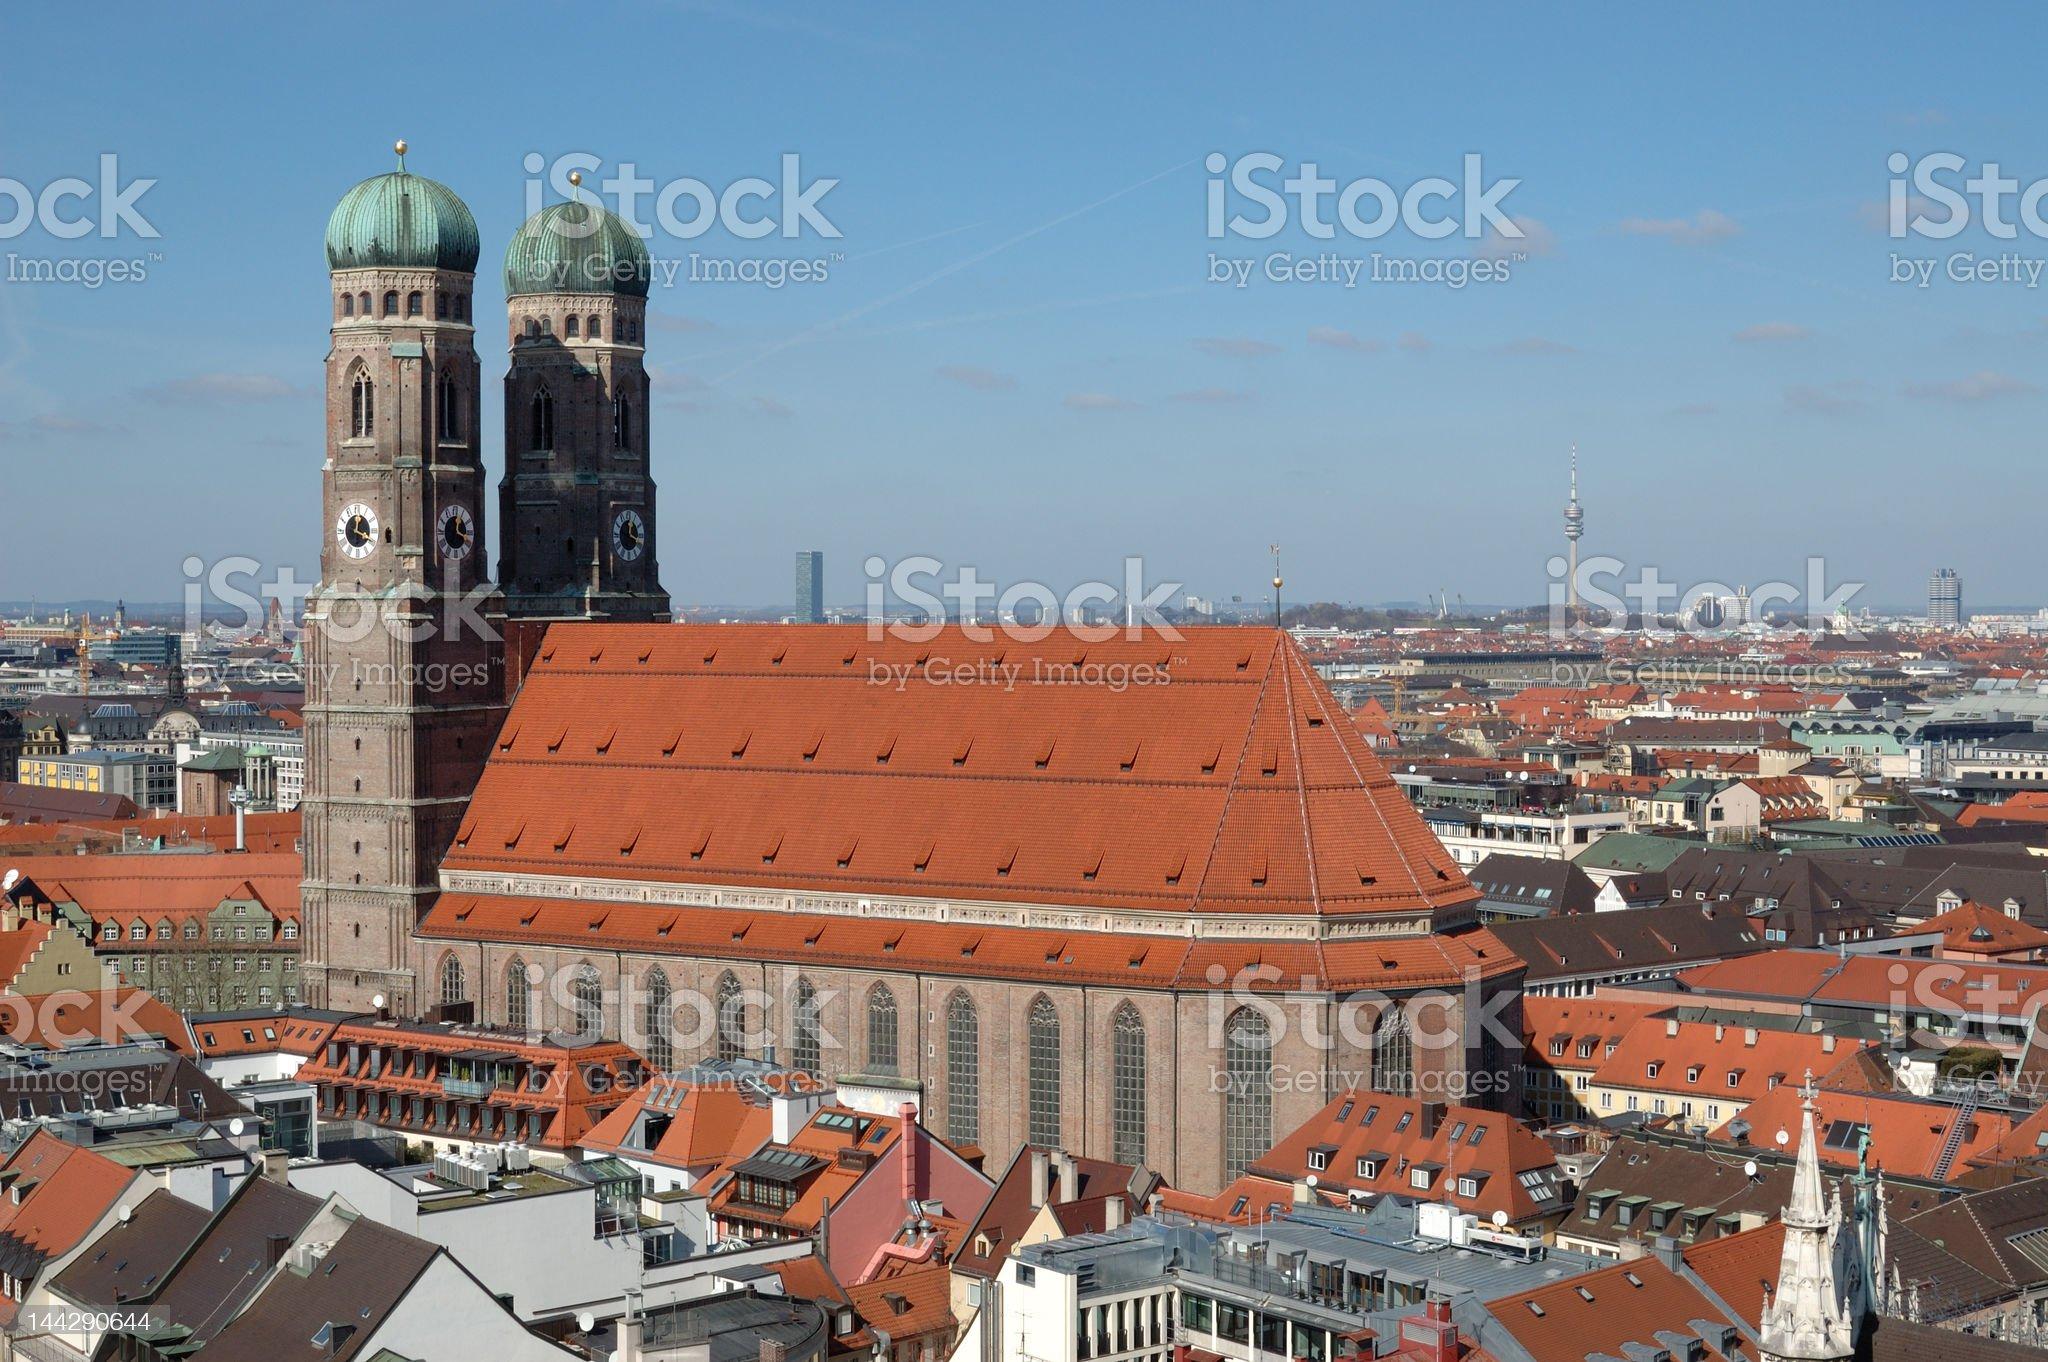 Munich Frauenkirche royalty-free stock photo